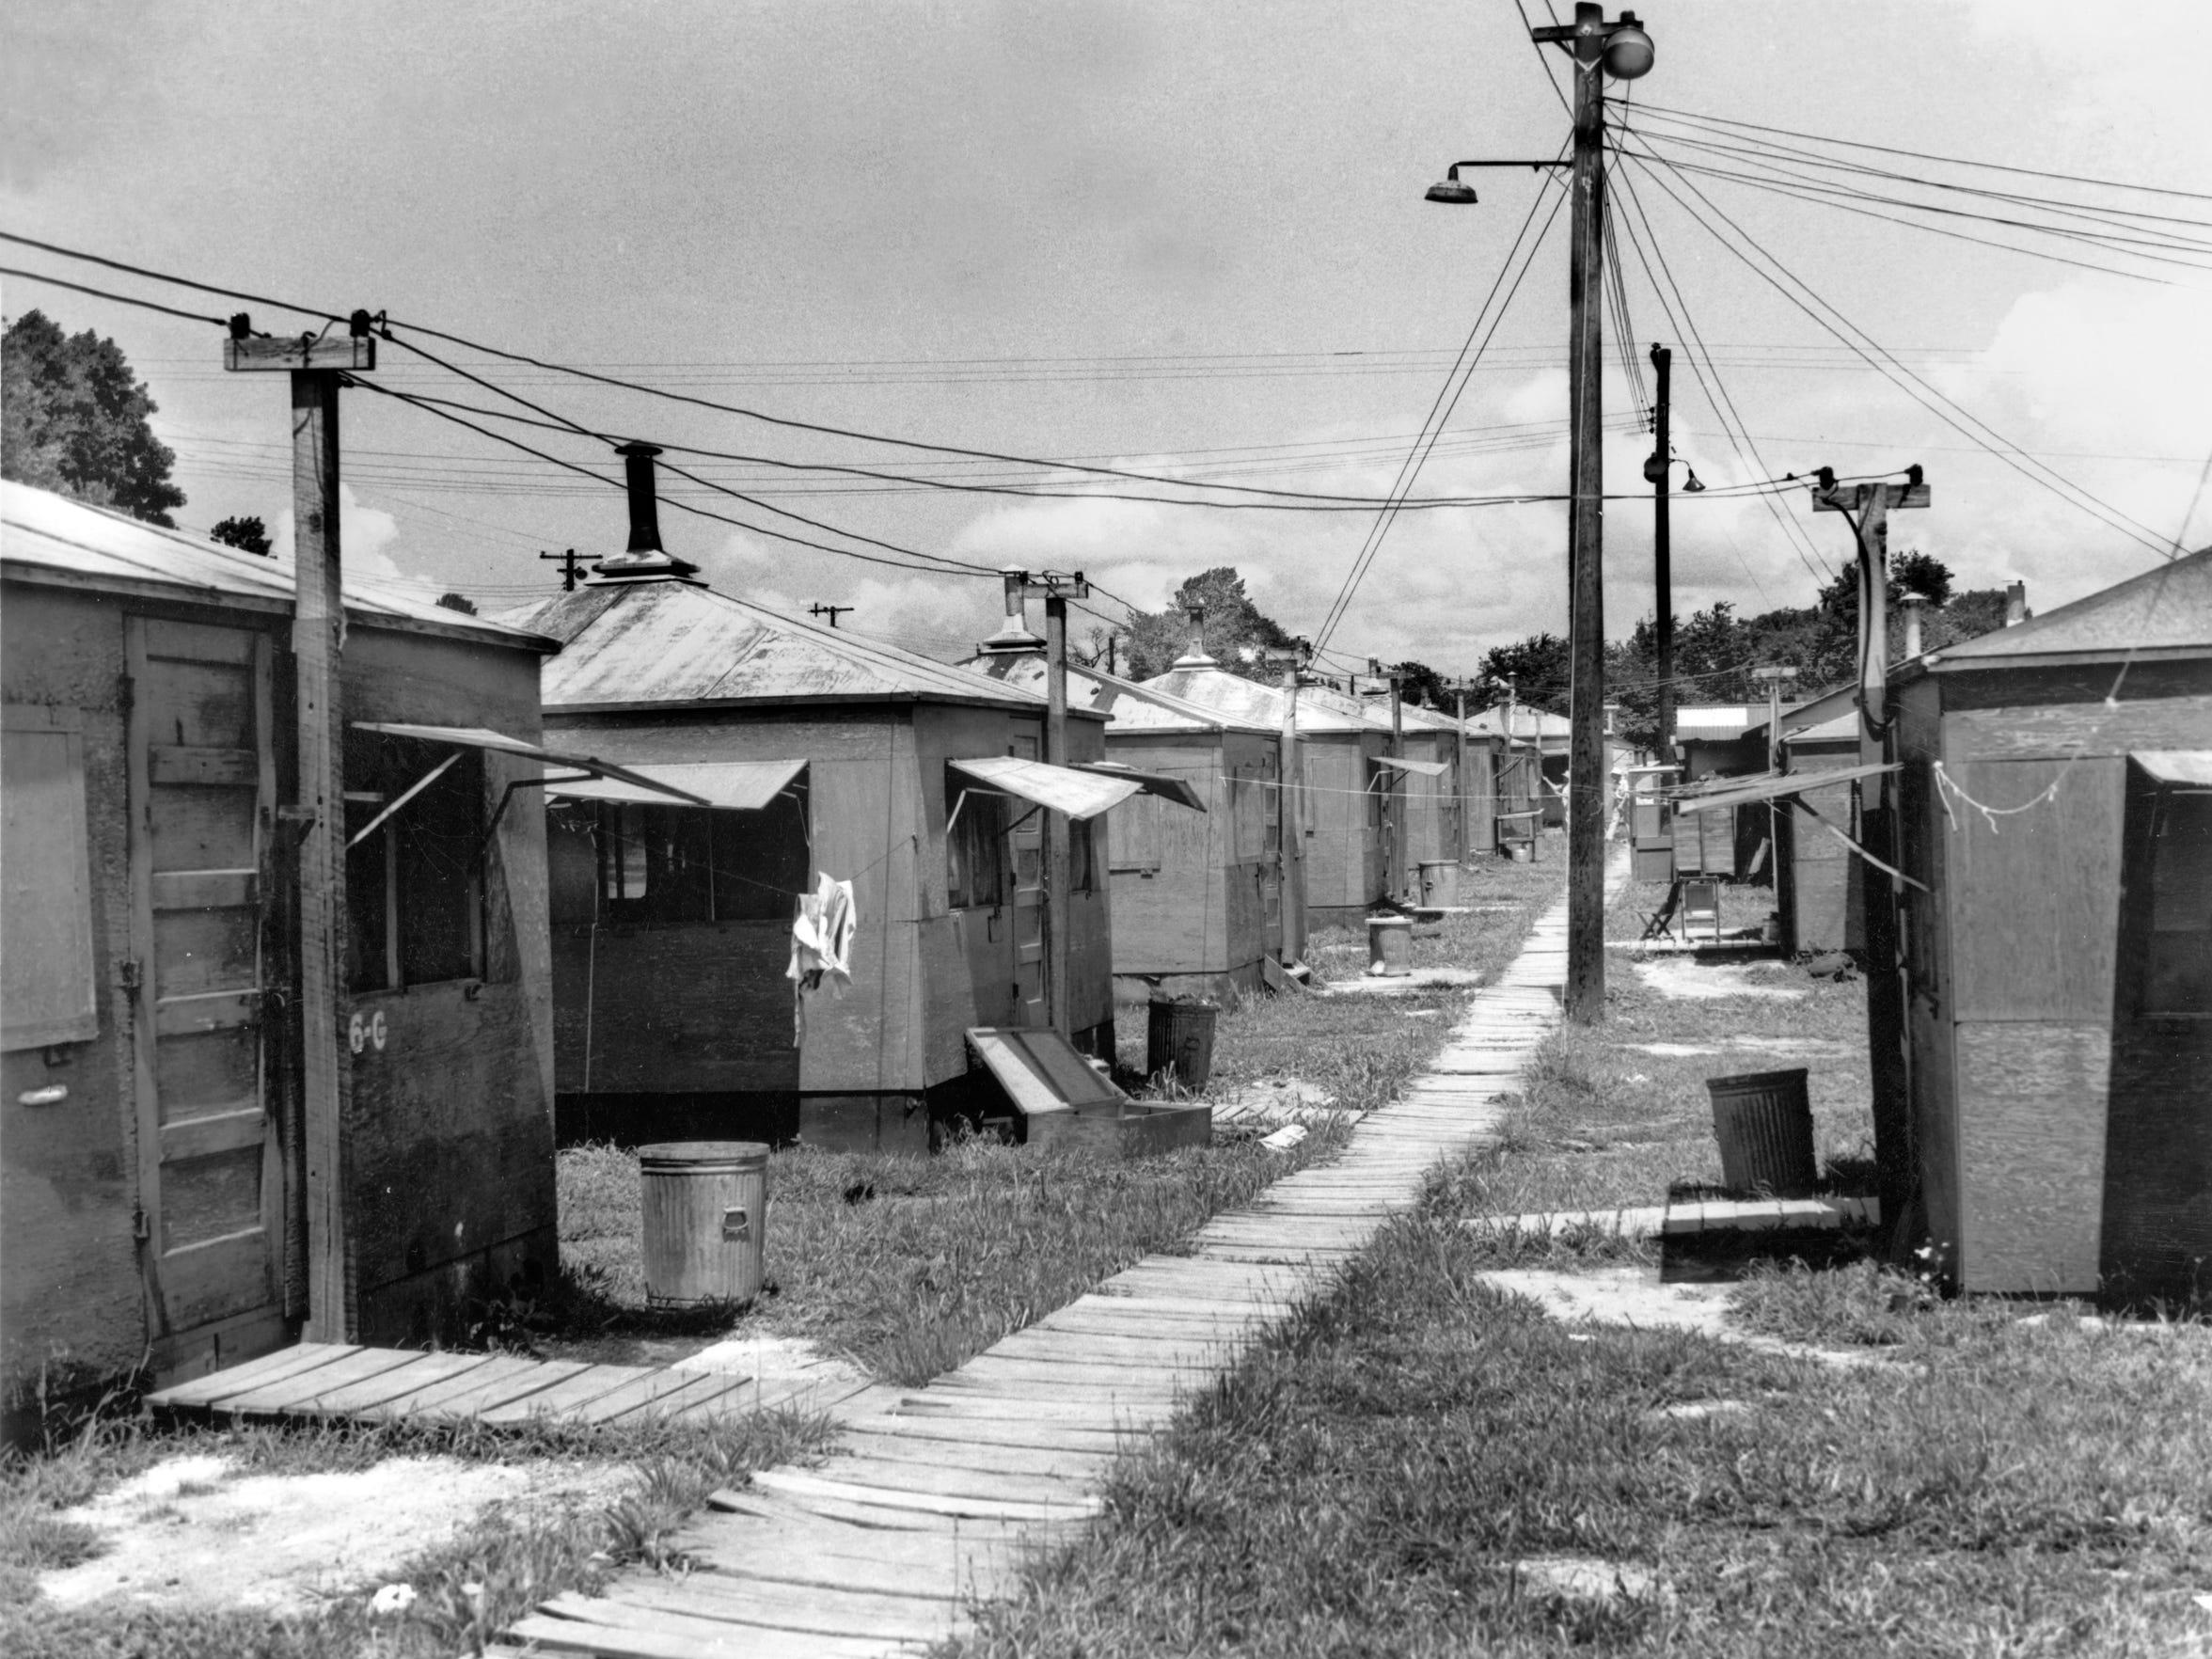 During World War II, African-Americans in Oak Ridge